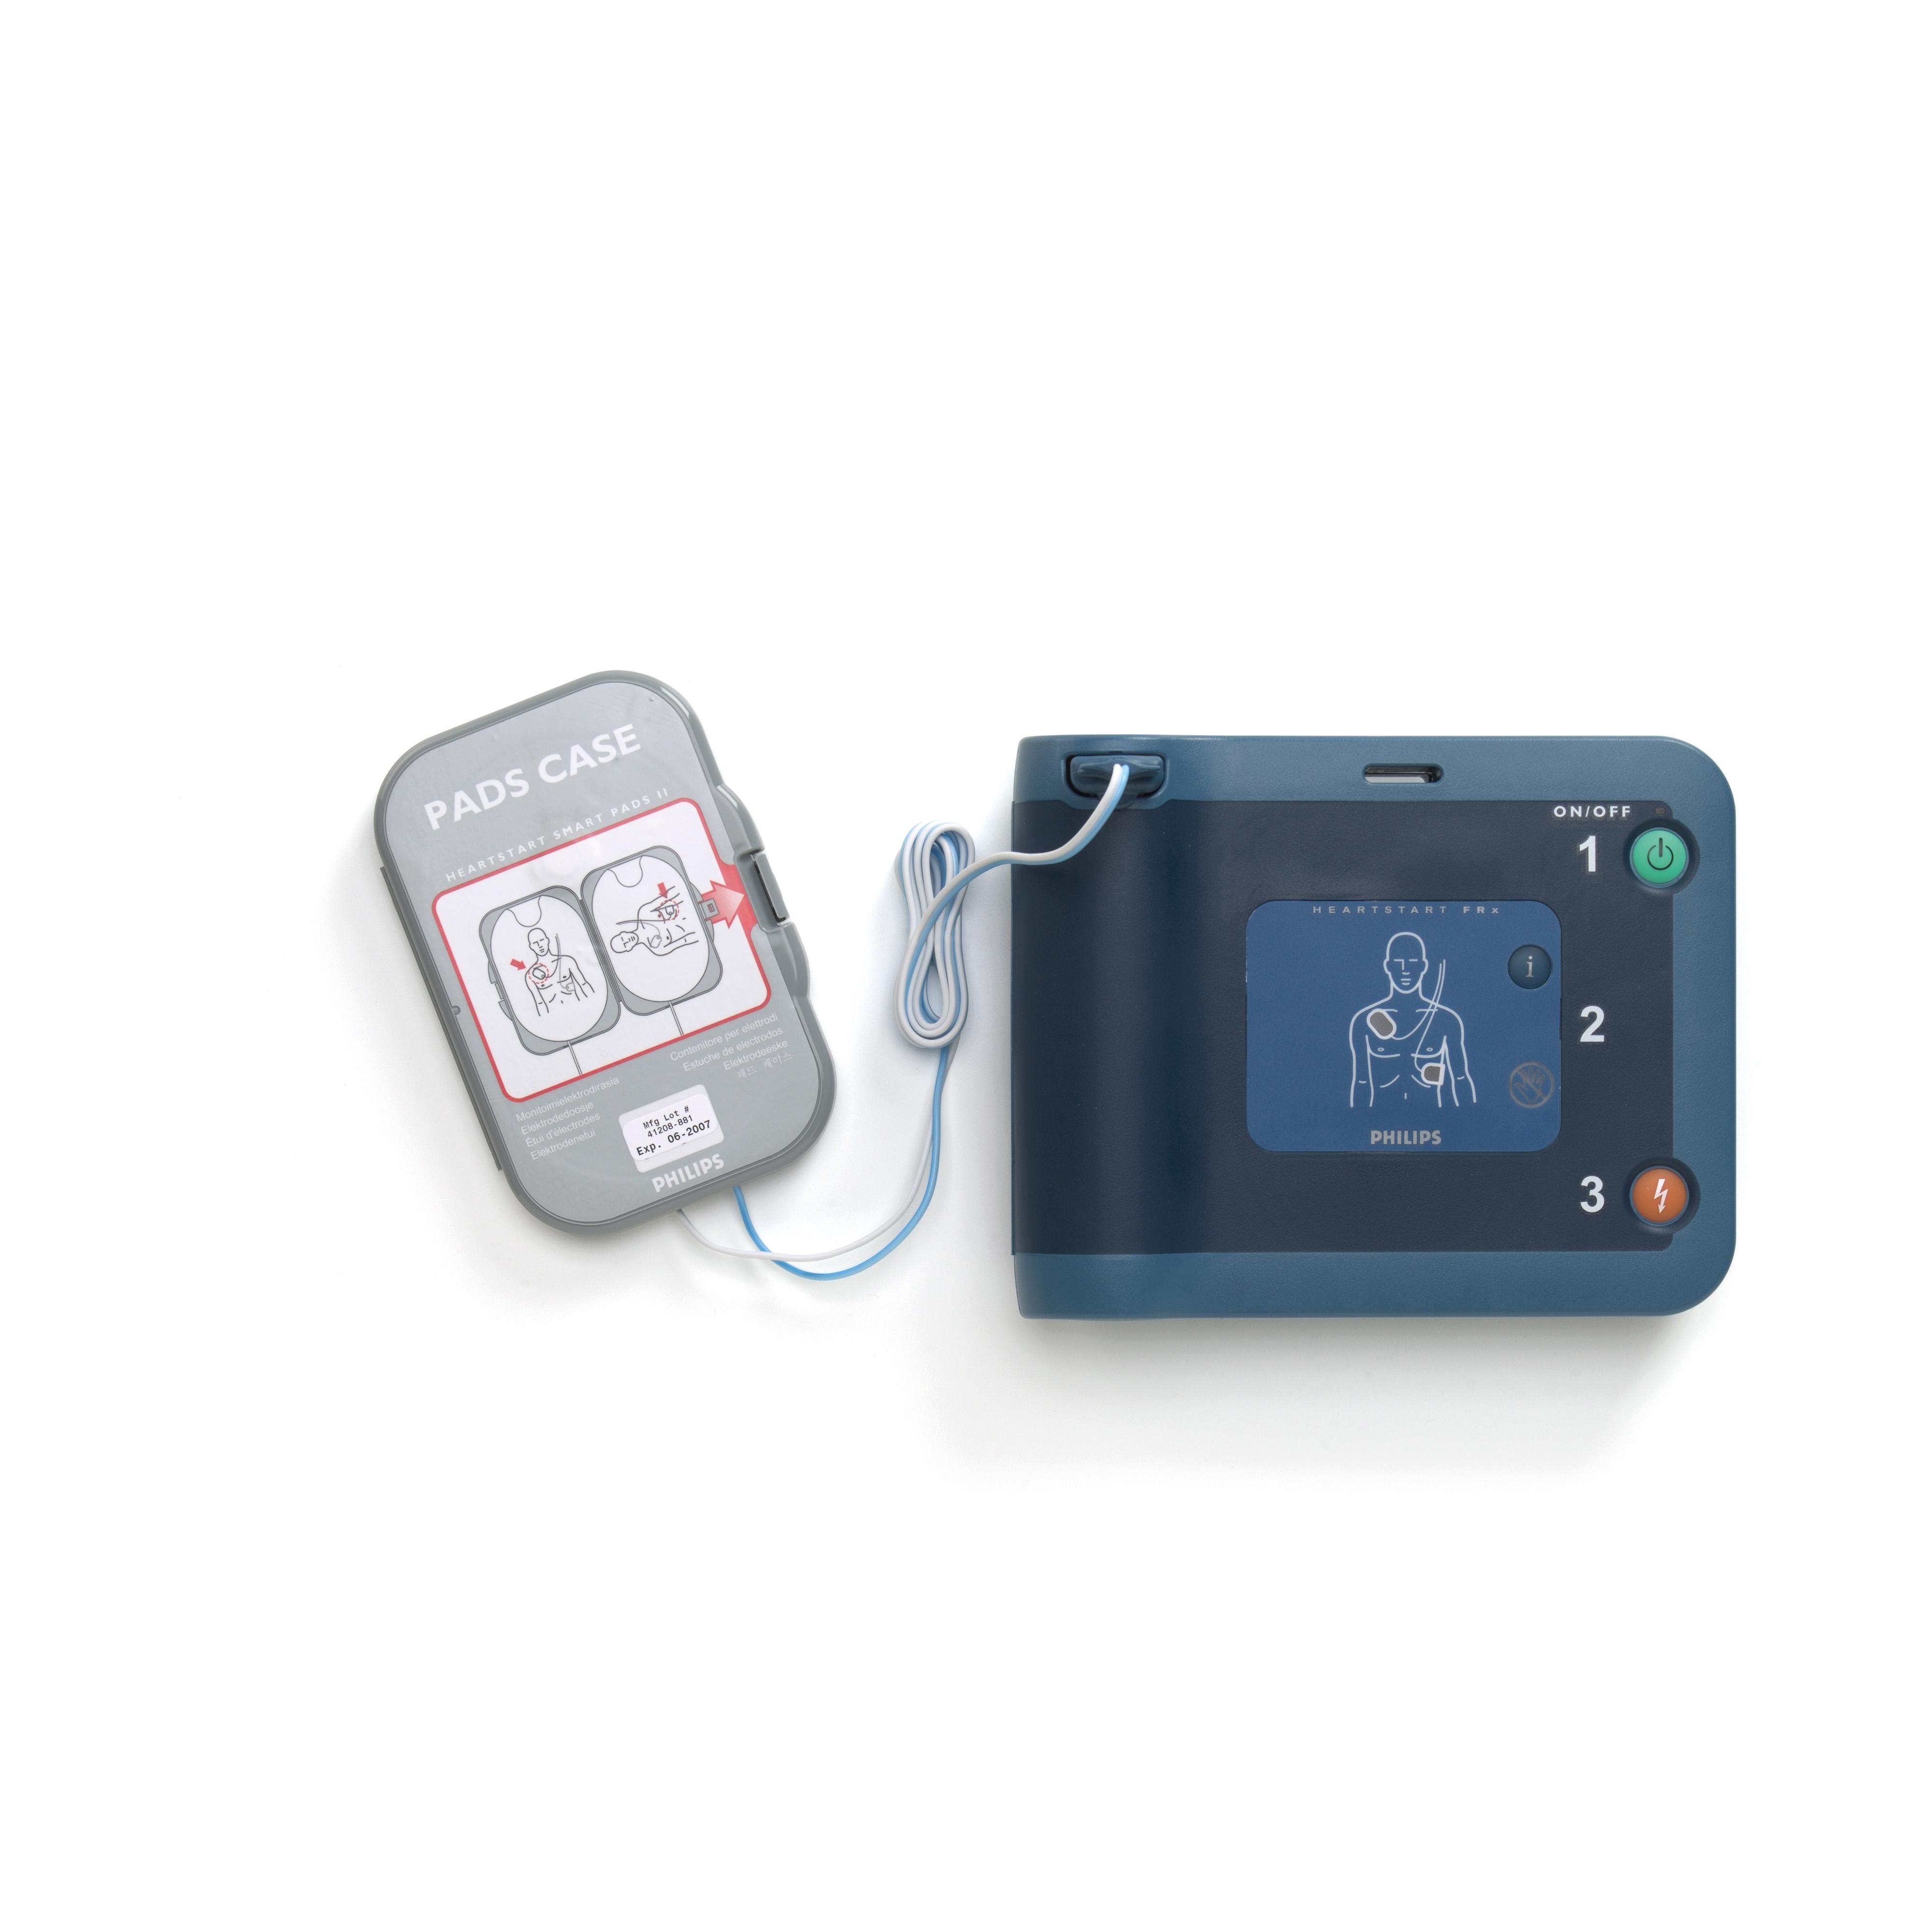 philips heartstart frx aed defibrillator manual